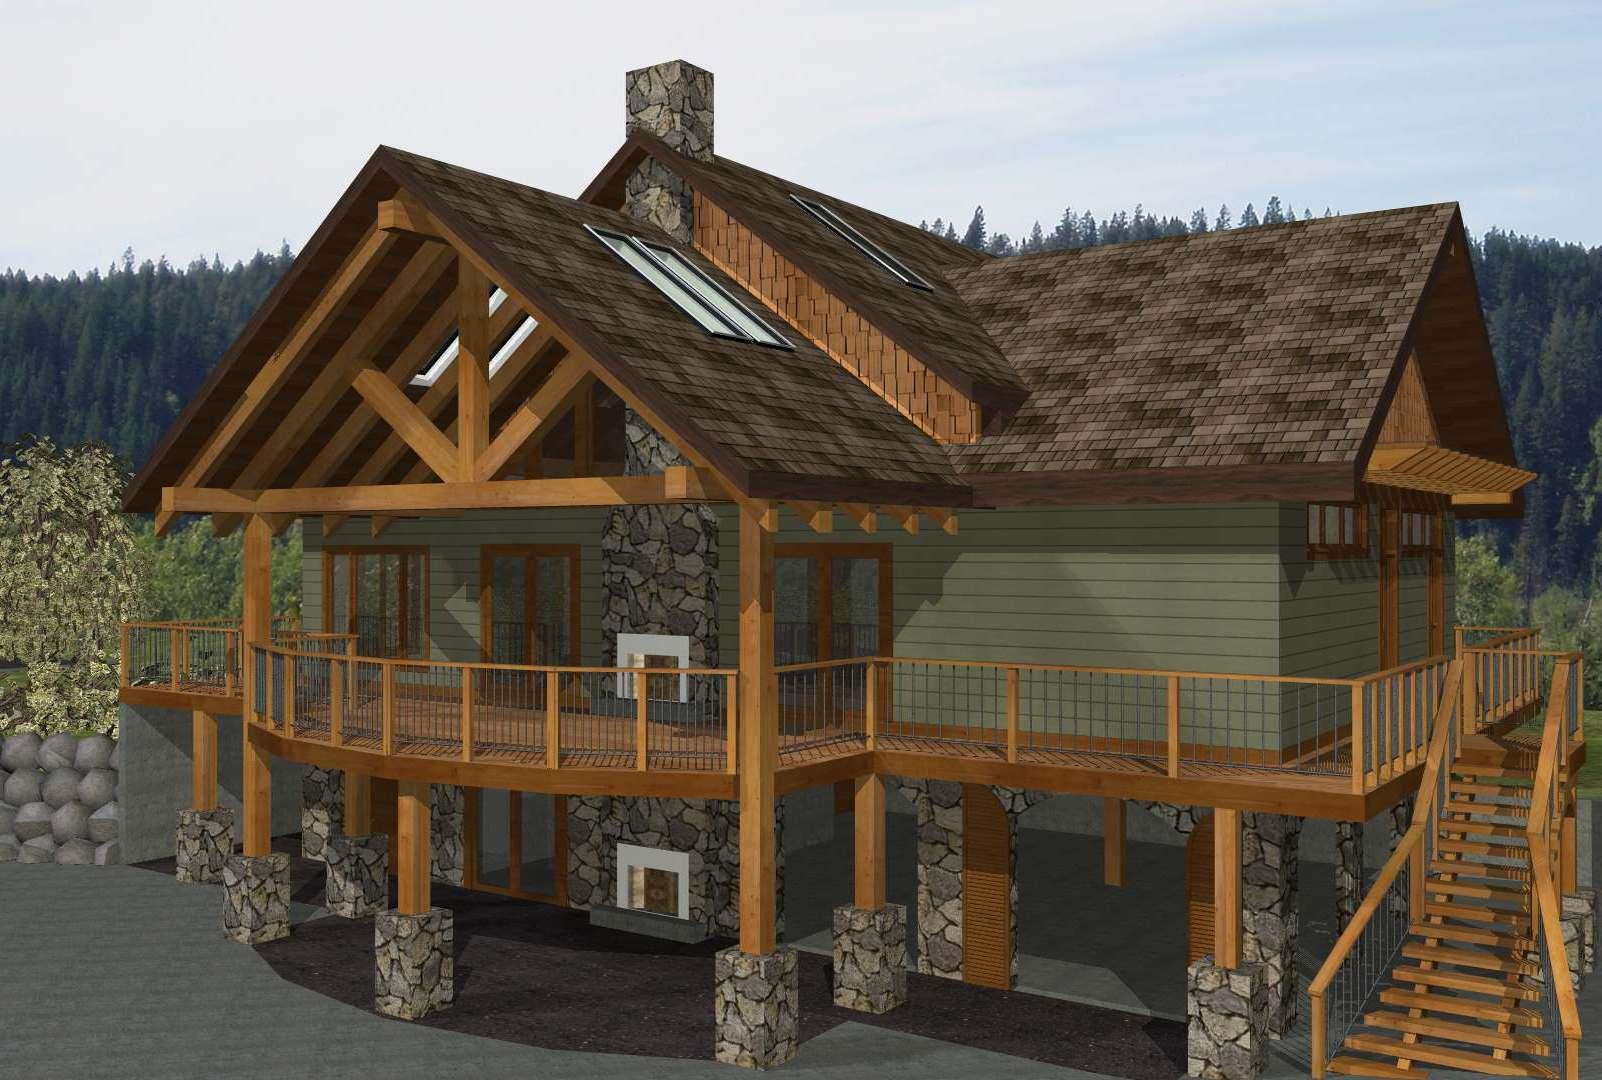 Springs RV Resort BC, RV camping, short term and yearly RV lot rentals